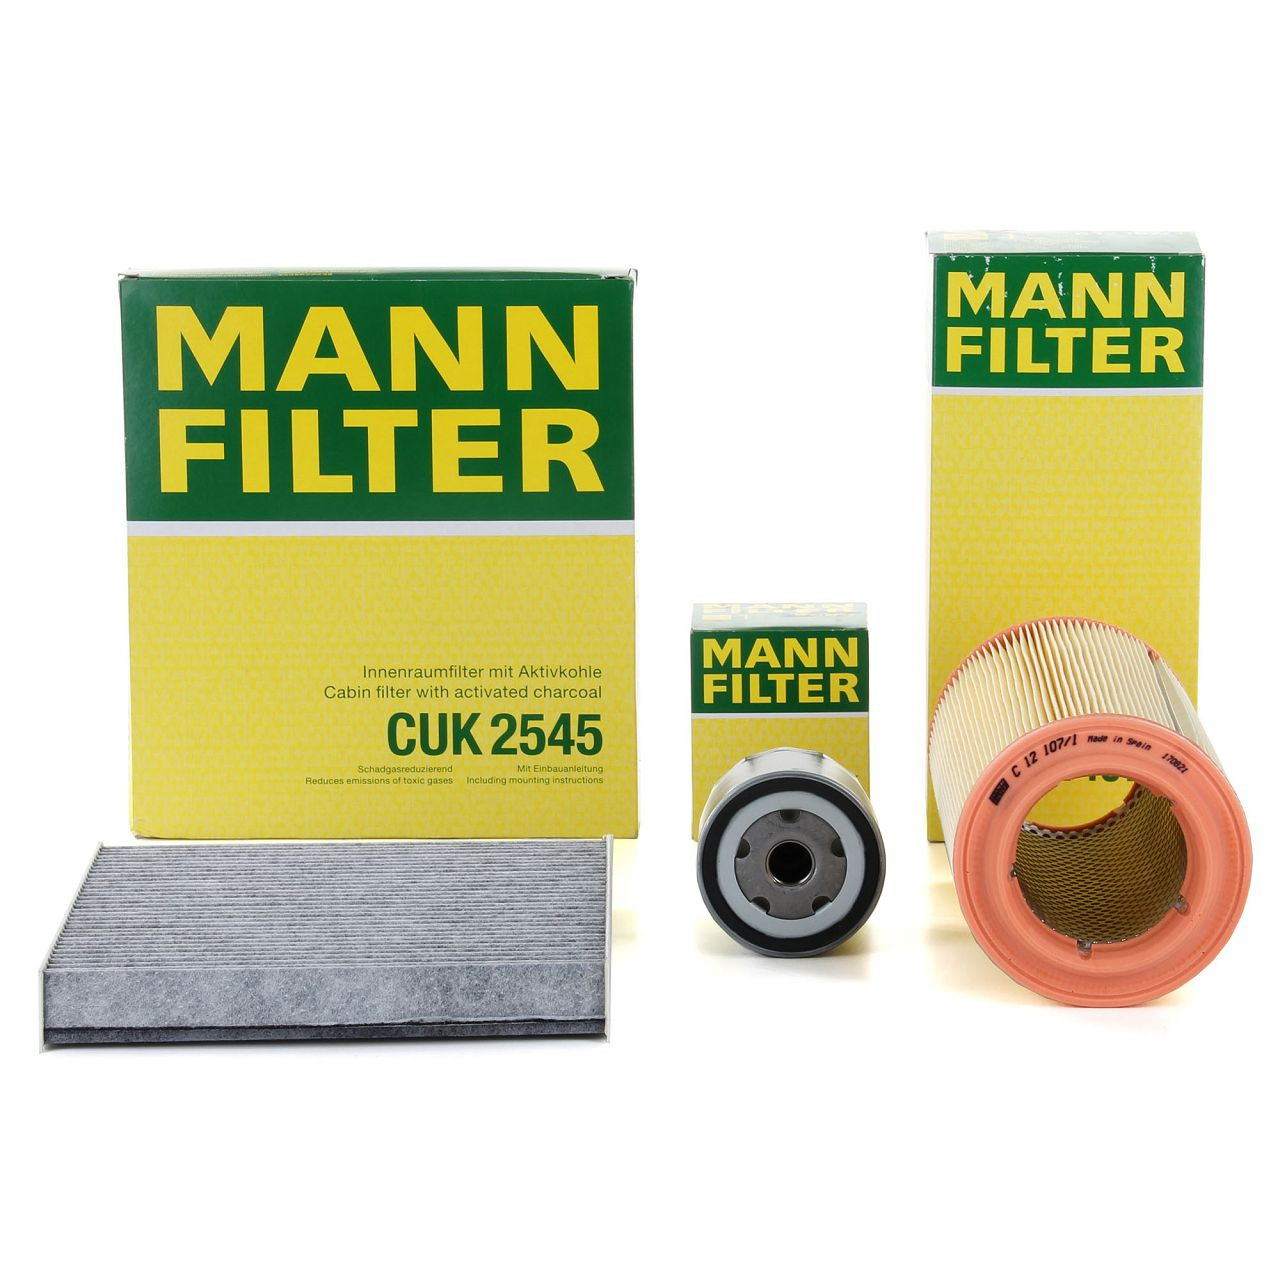 MANN Inspektionskit Filterpaket für AUDI A2 (8Z0) 1.4 75 PS + 1.6 FSI 110 PS